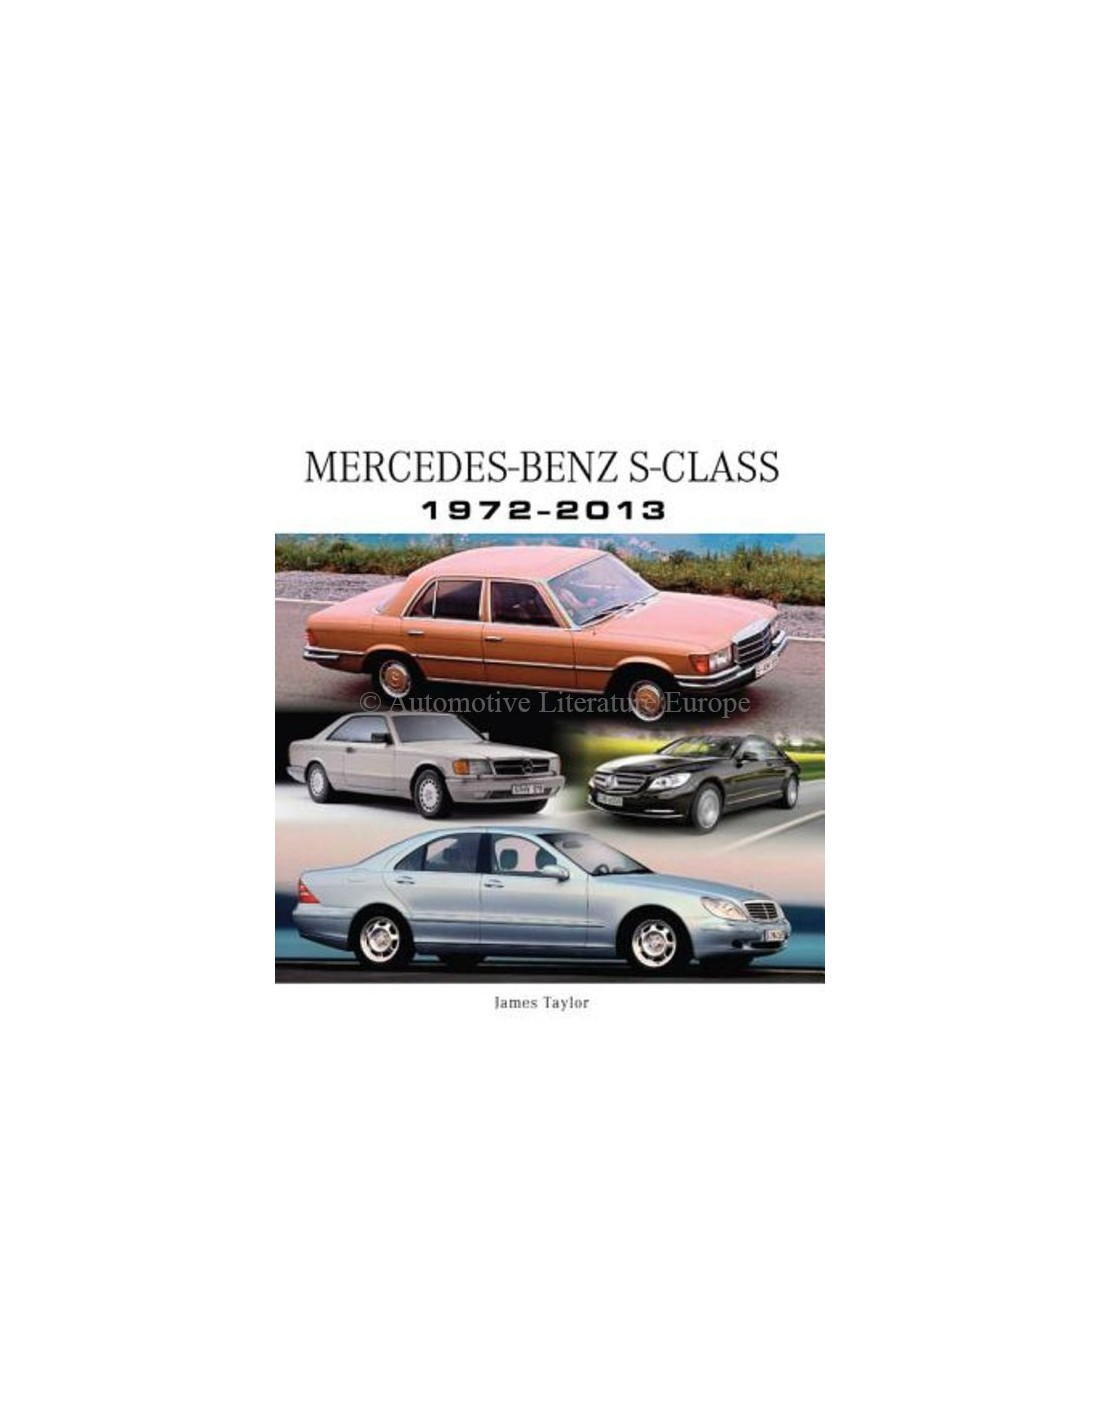 Mercedes benz s class 1972 2013 james taylor book for Mercedes benz books